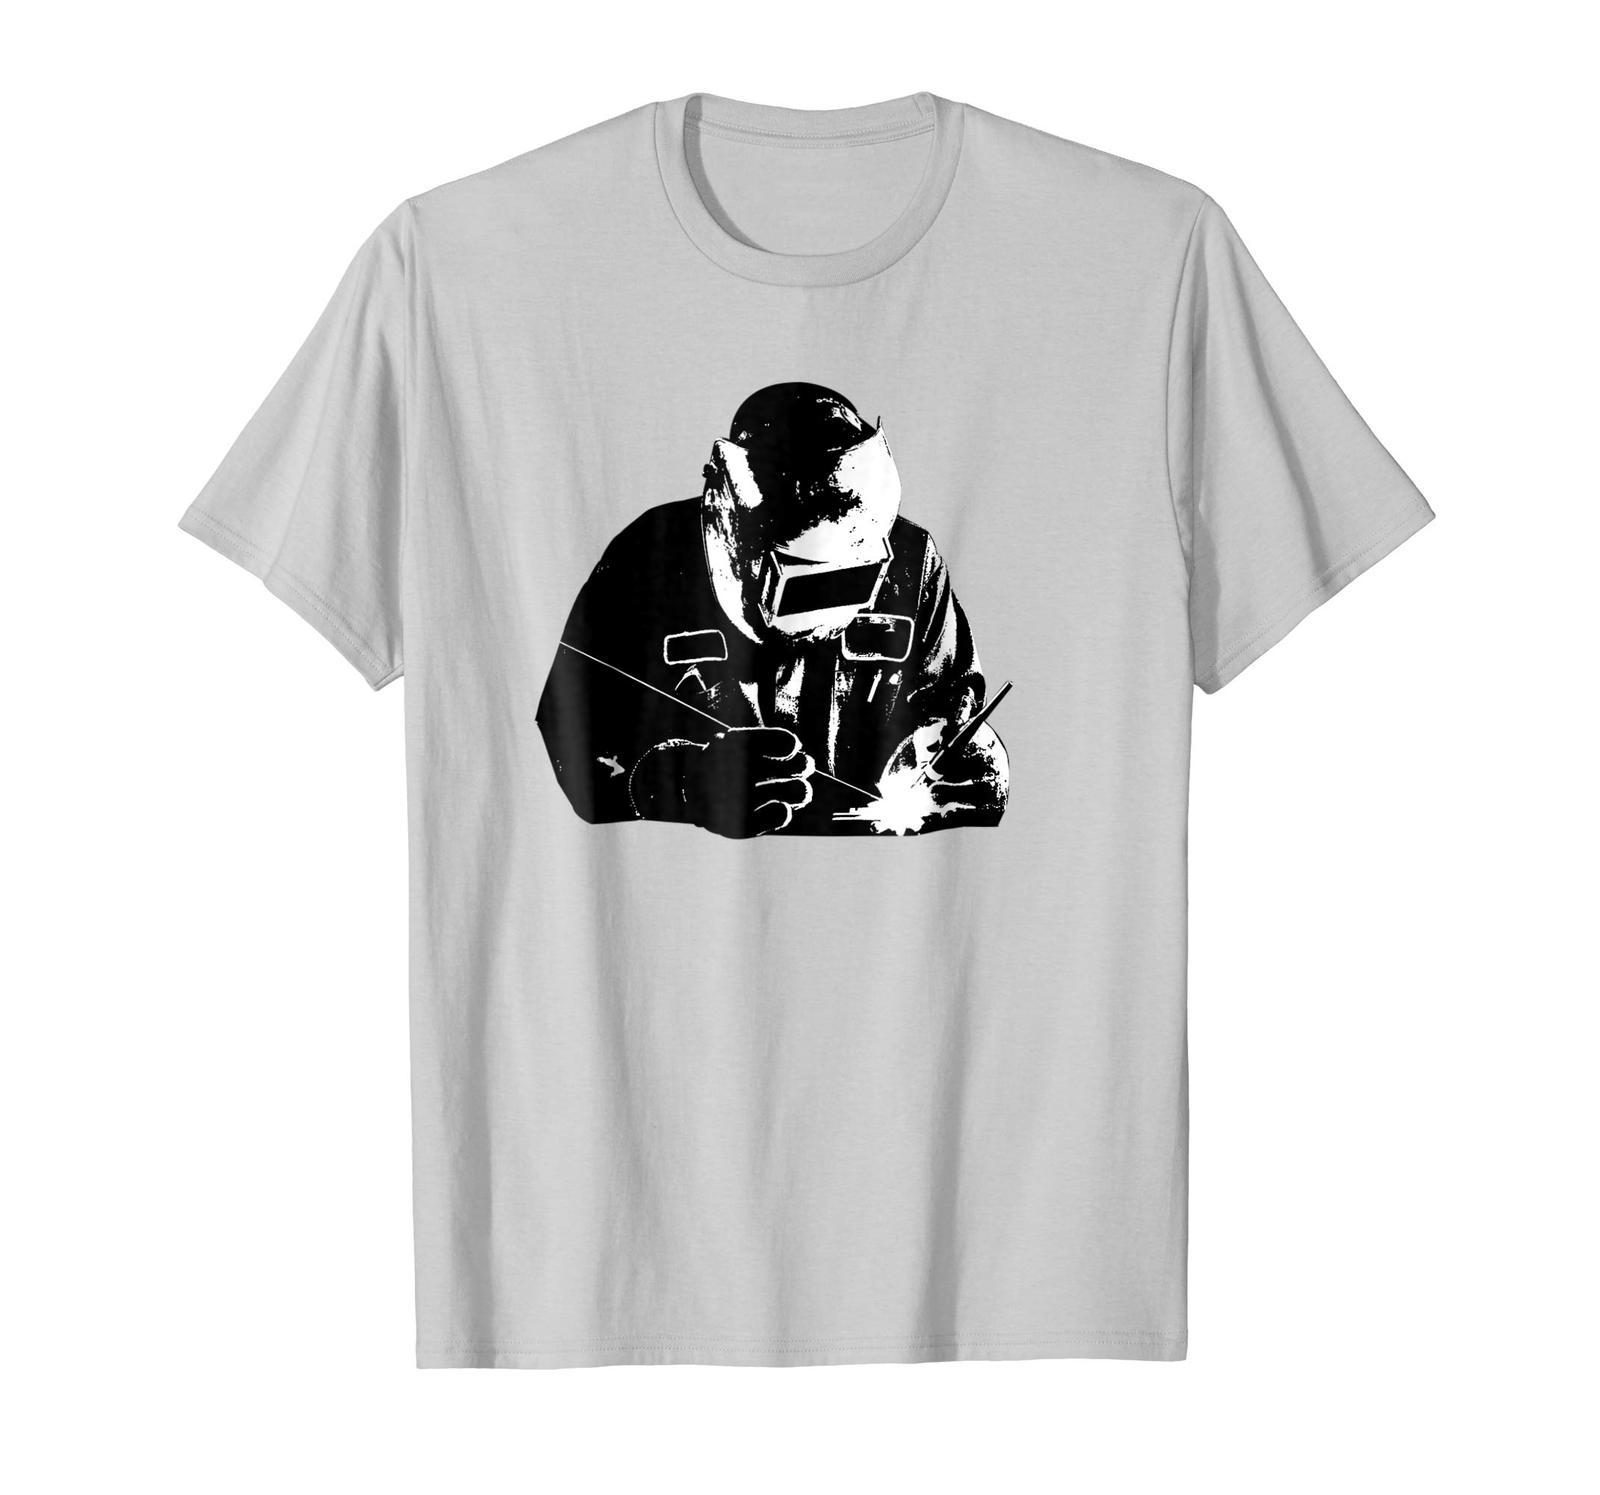 Uncle Shirts -   Welder Silhouette Shirt | Cute Shadow Craftsman T-Shirt Gift Me